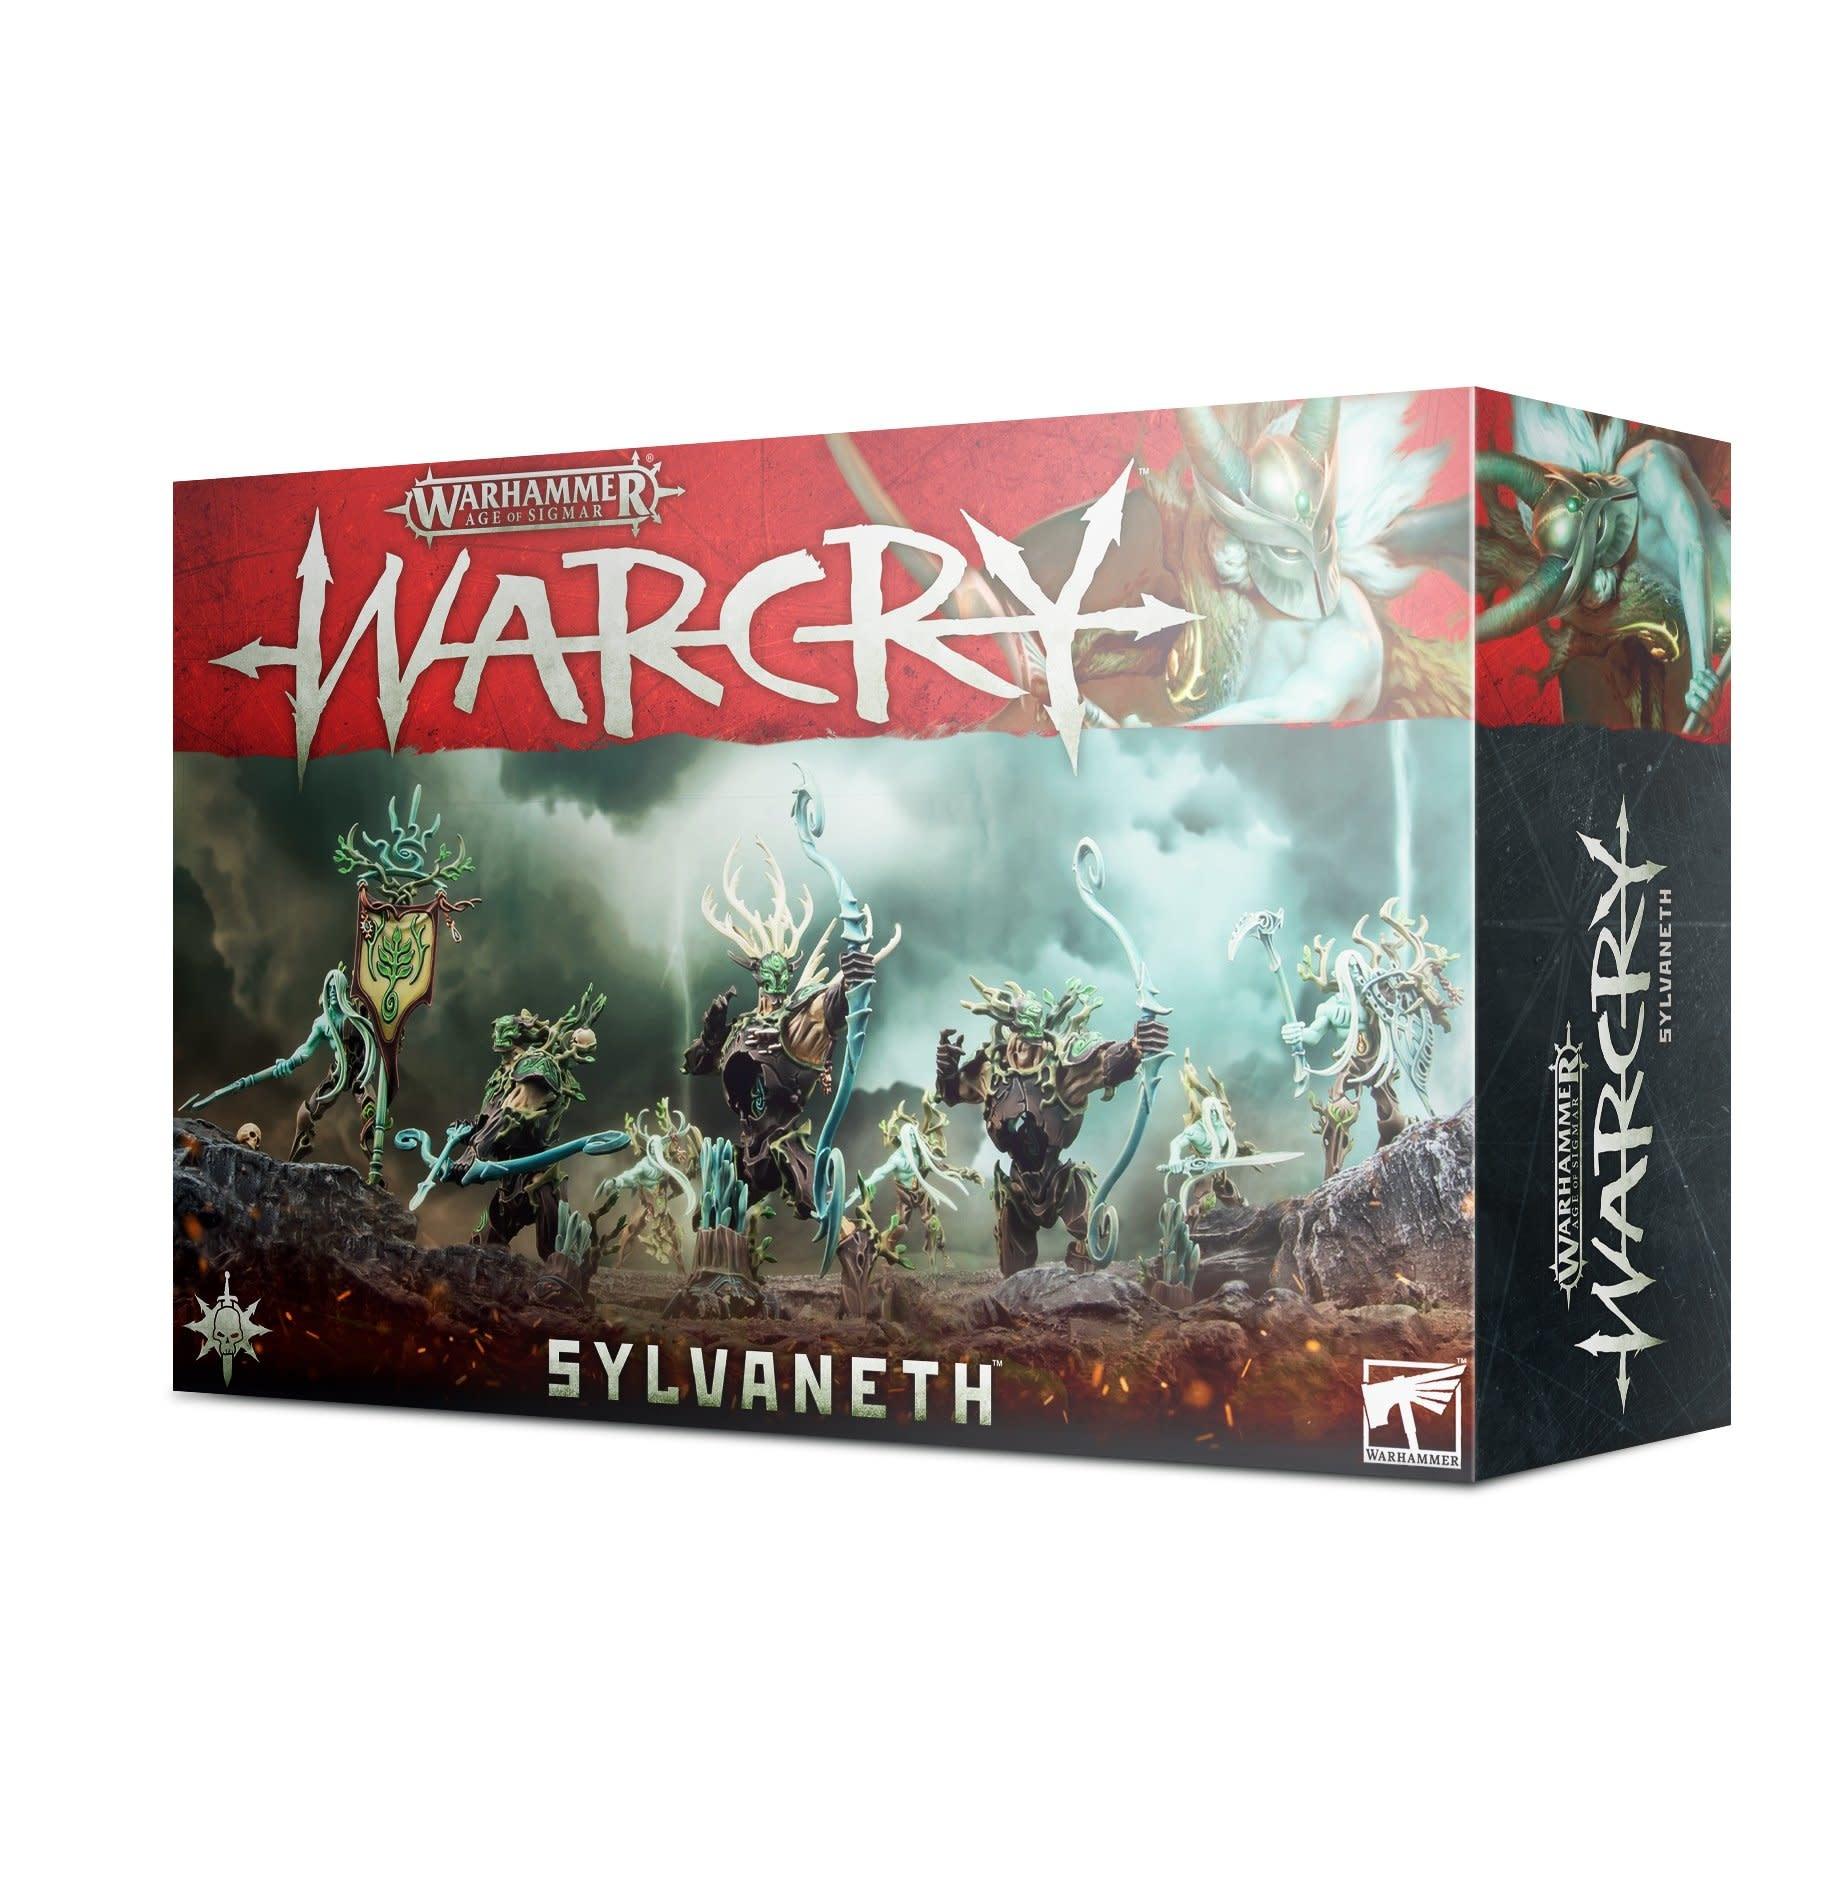 Games-Workshop Warcry: Sylvaneth